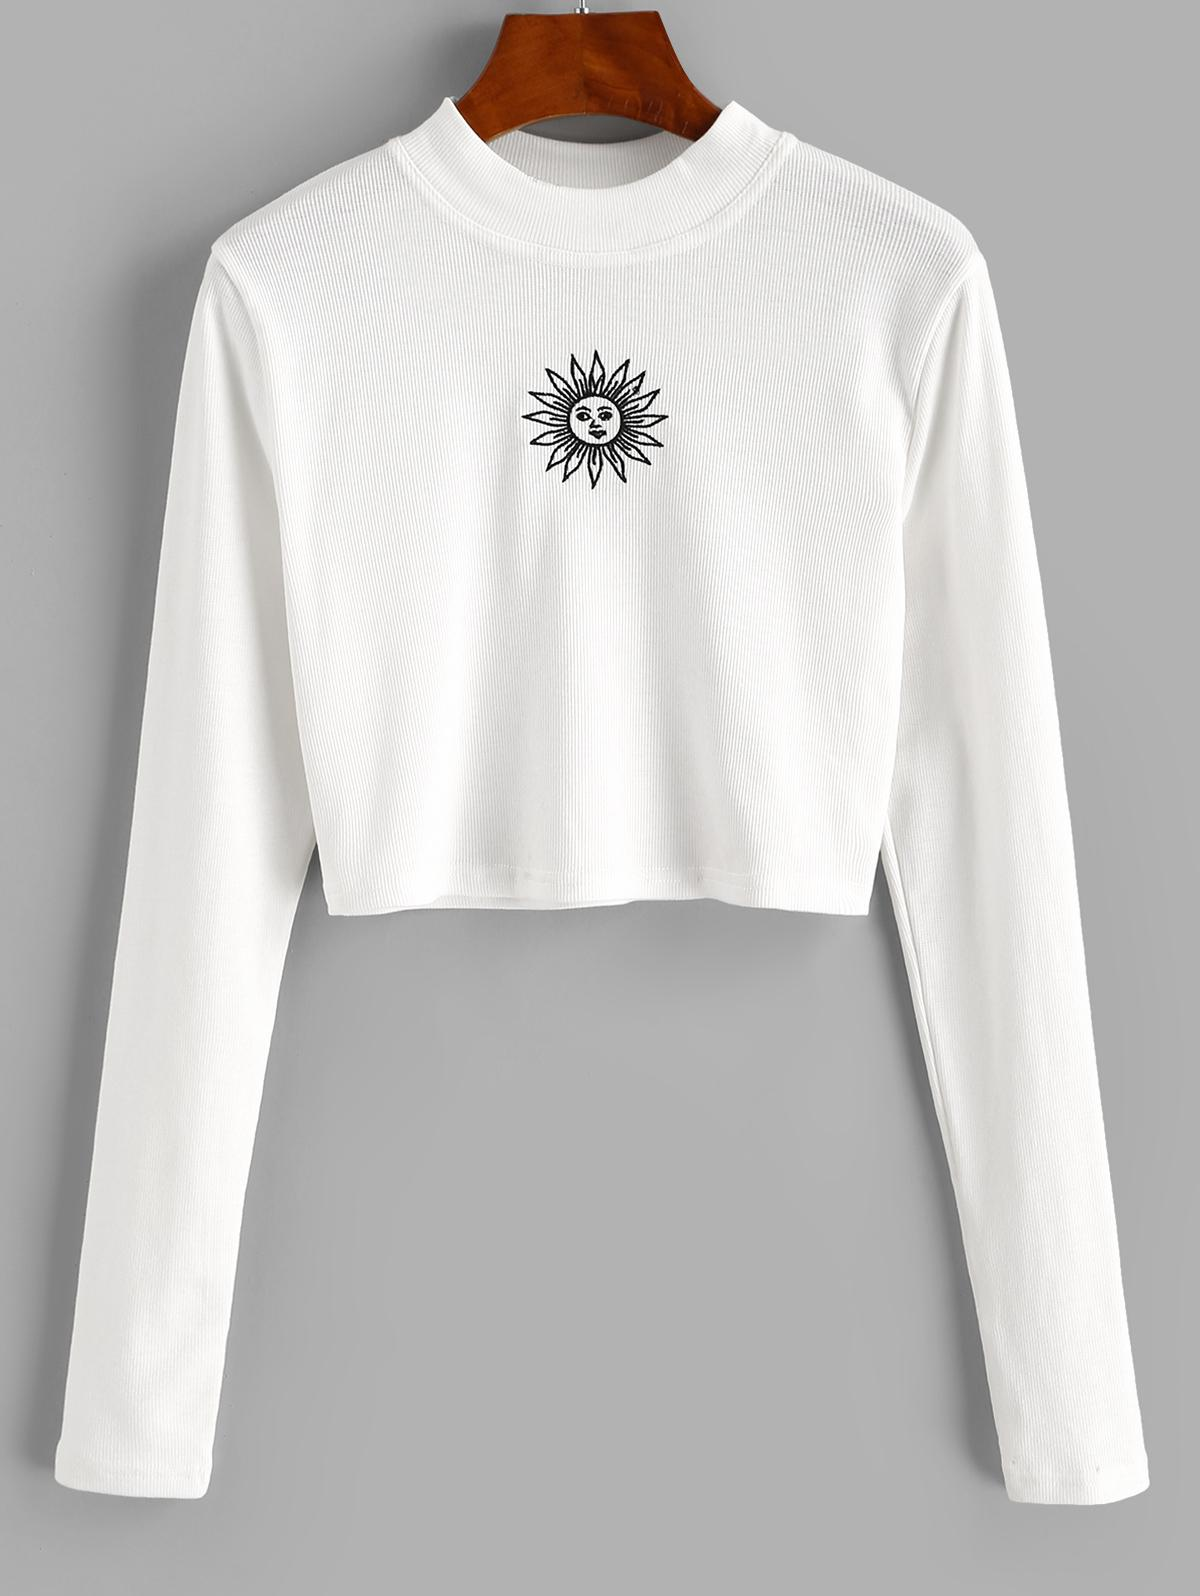 ZAFUL Crew Neck Sun Embroidered Crop Top